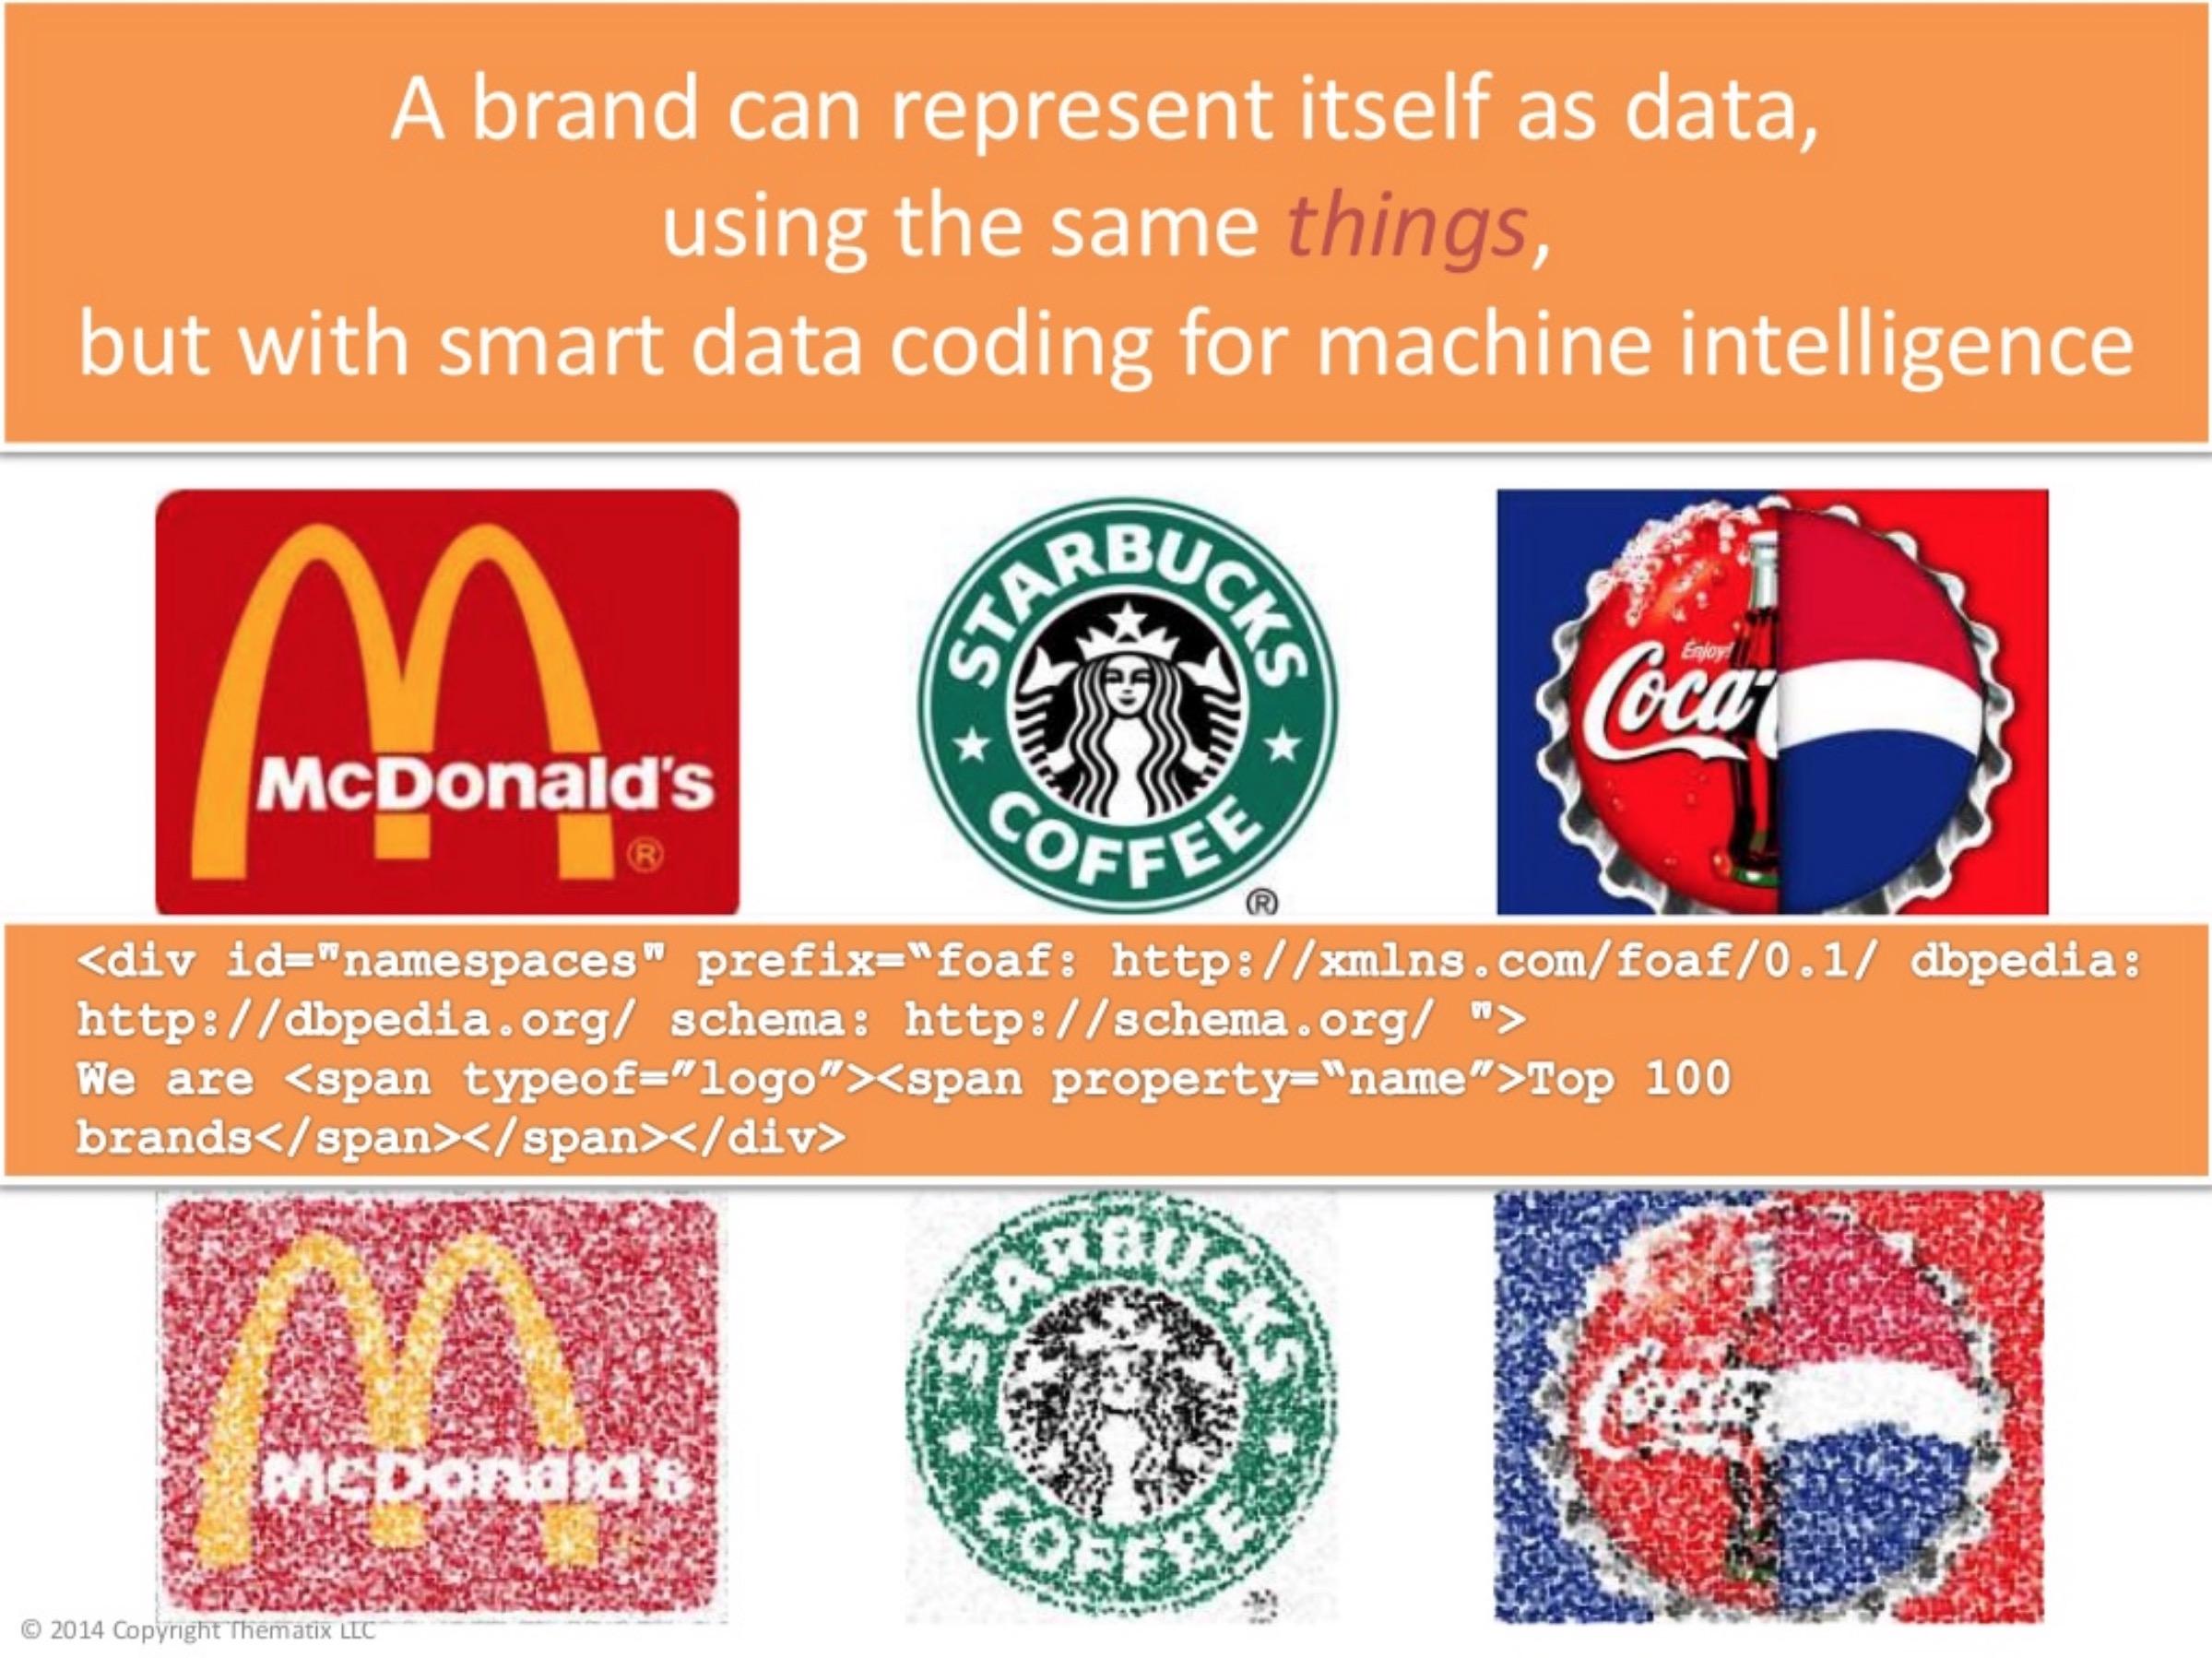 Smart data coding